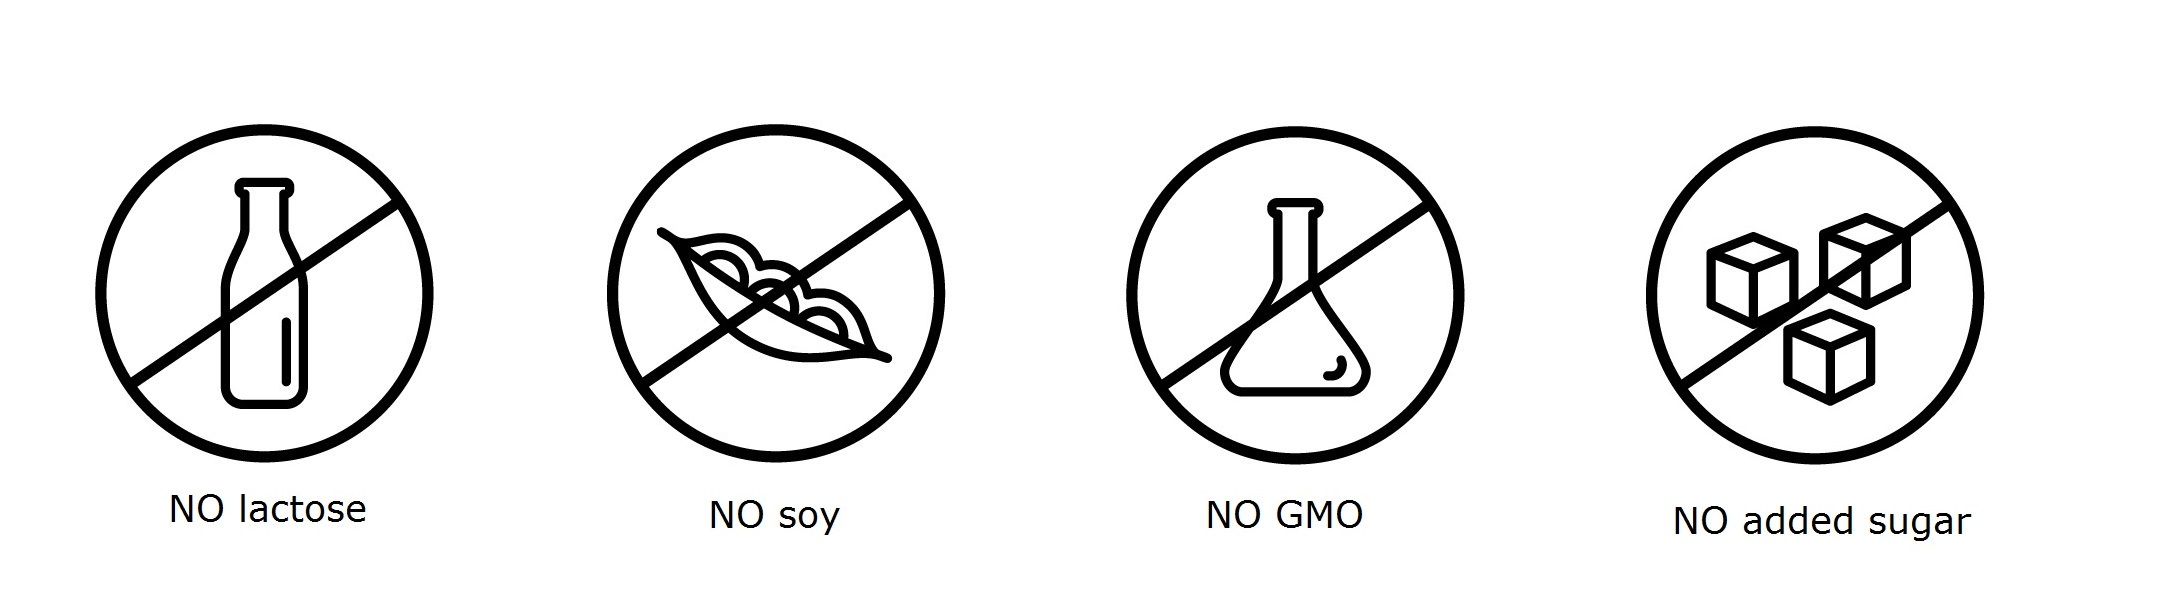 SOY FREE LACTOSE FREE NO ADDED SUGAR NON GMO